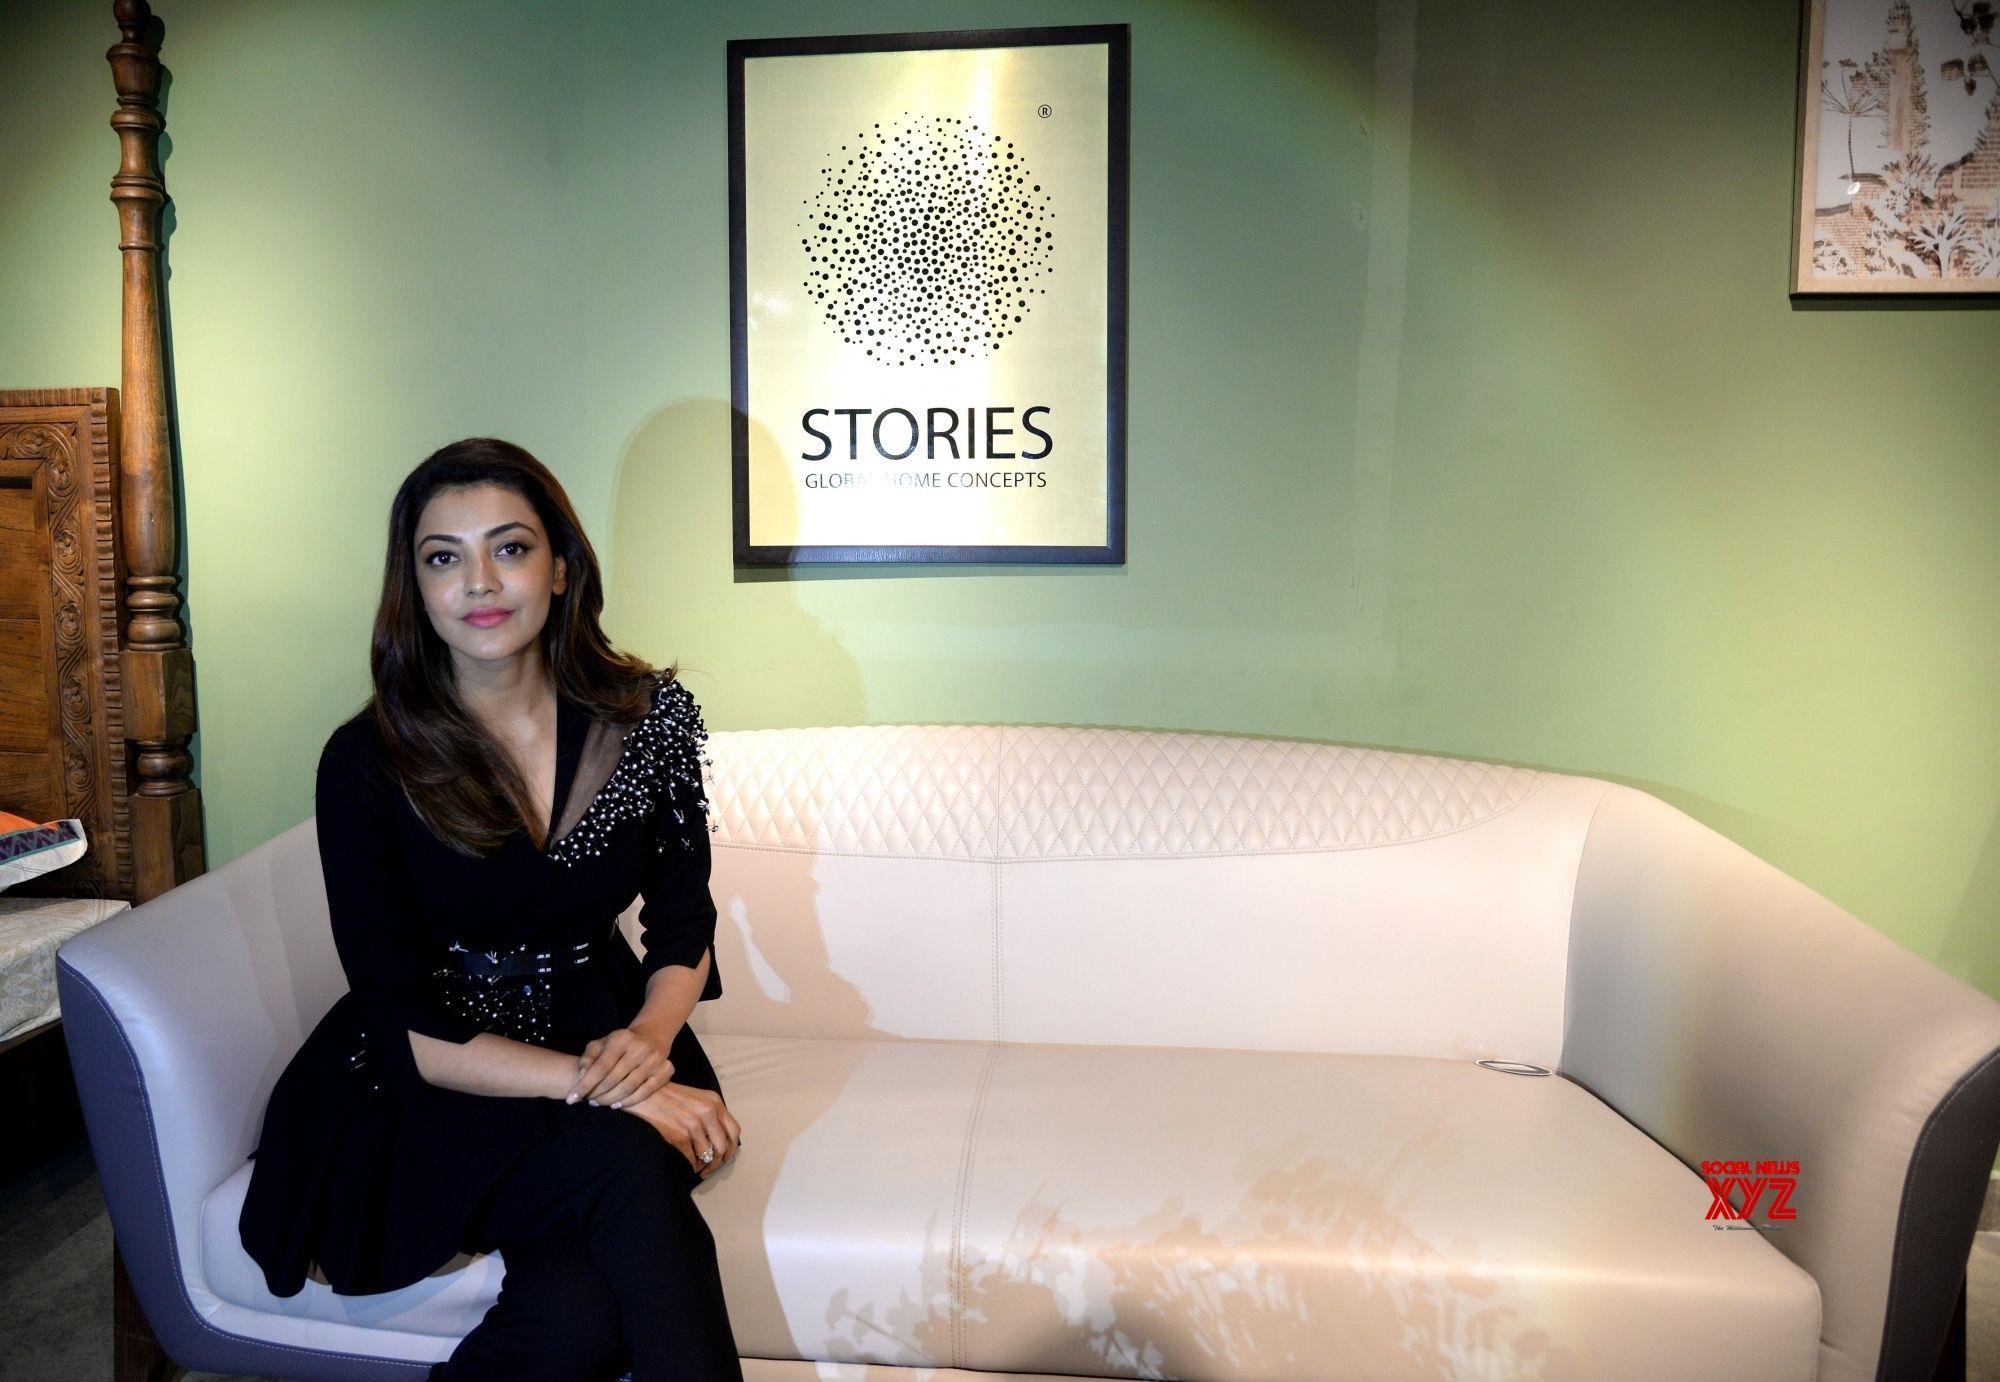 Bengaluru: Actress Kajal Aggarwal at the launch Dubai based Bronet Group's global home concept showroom in Bengaluru on Aug 11, 2018. (Photo: IANS)